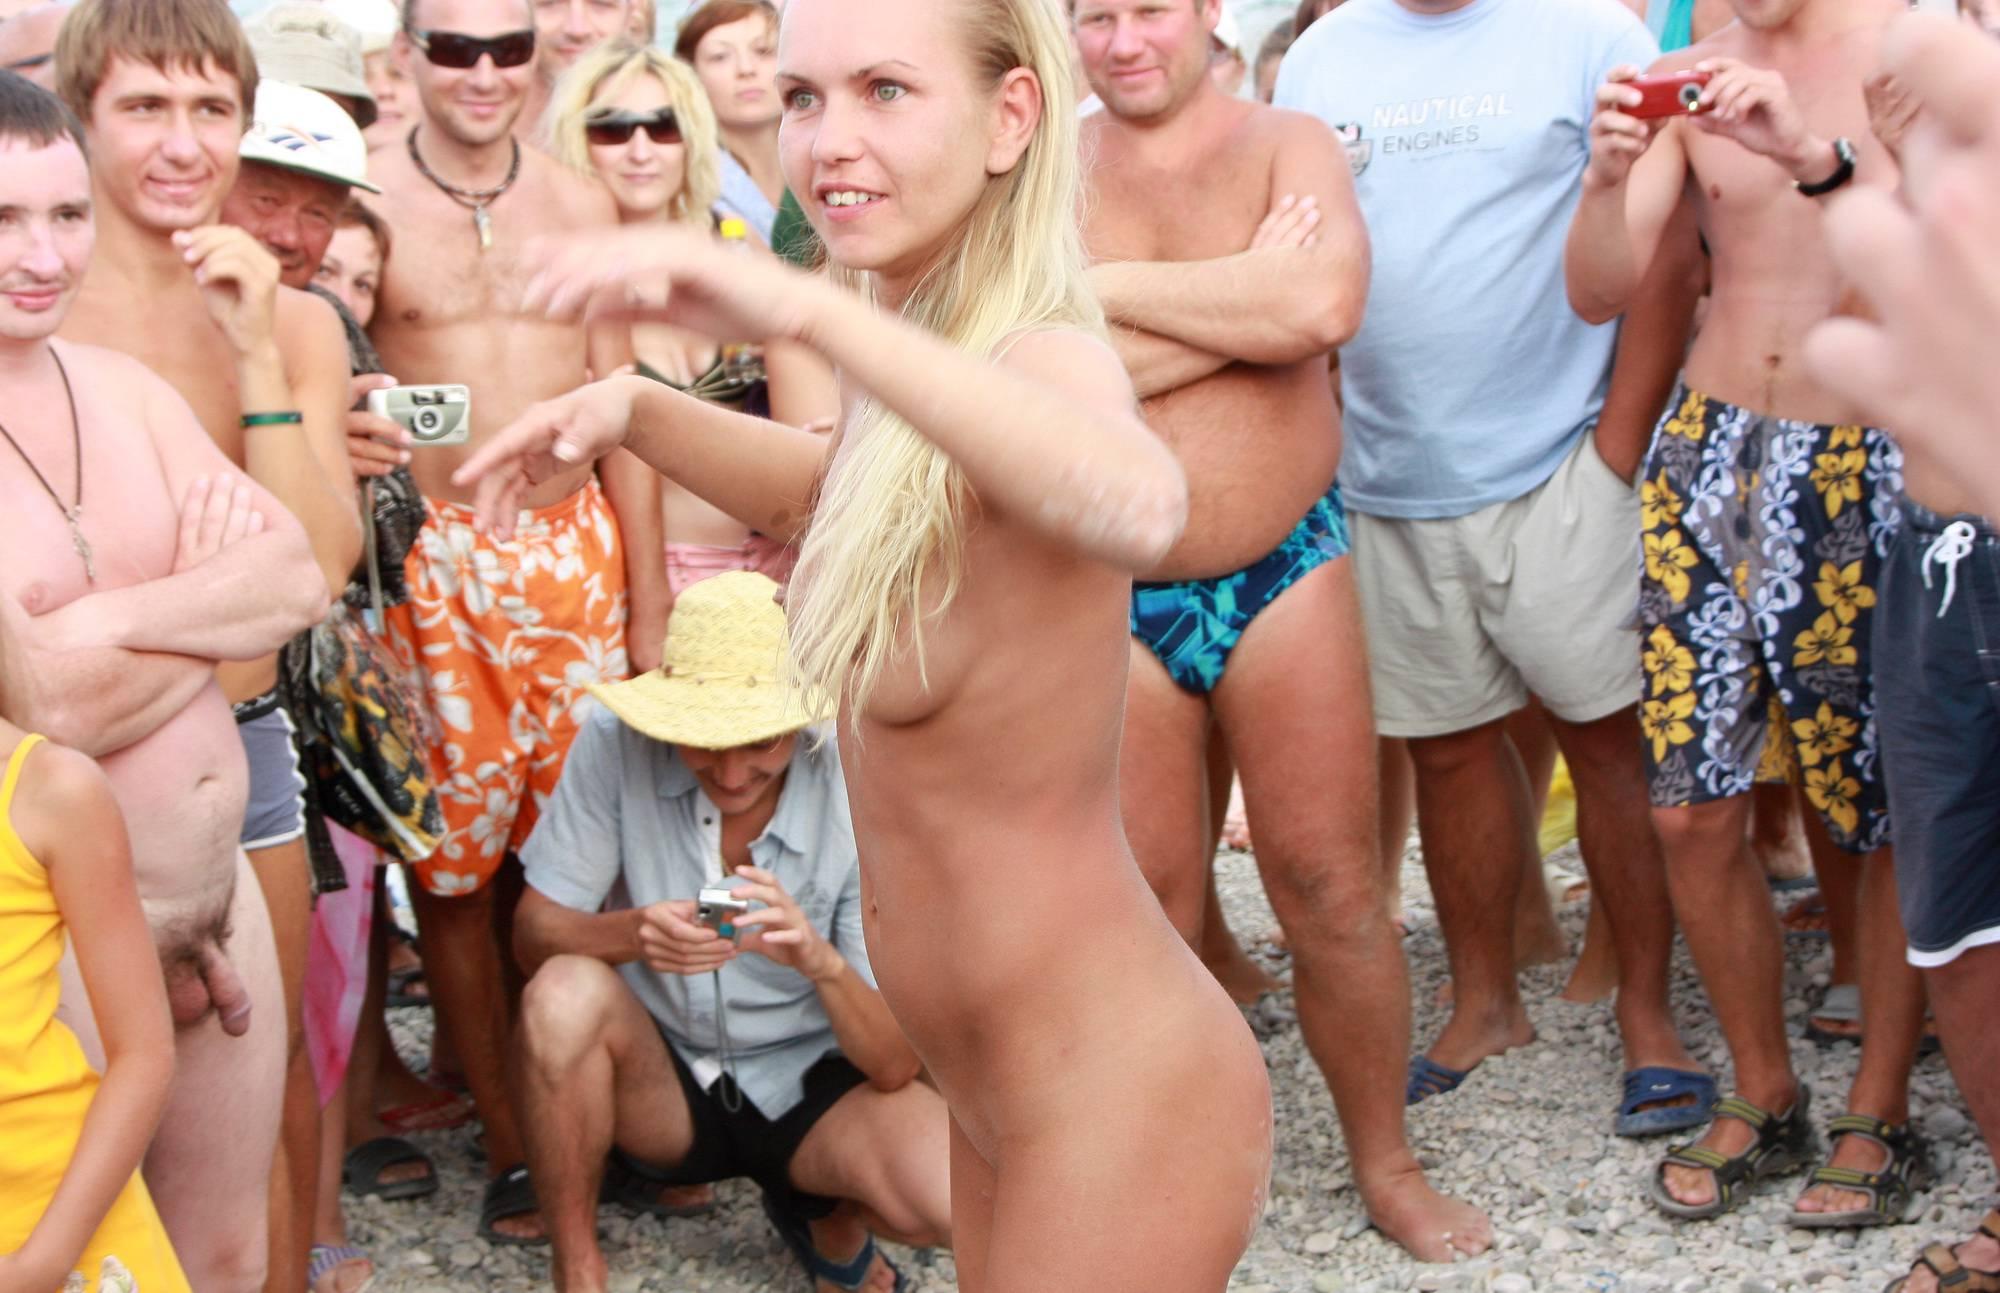 Nudist Photos Neptune Blondes Dance - 2